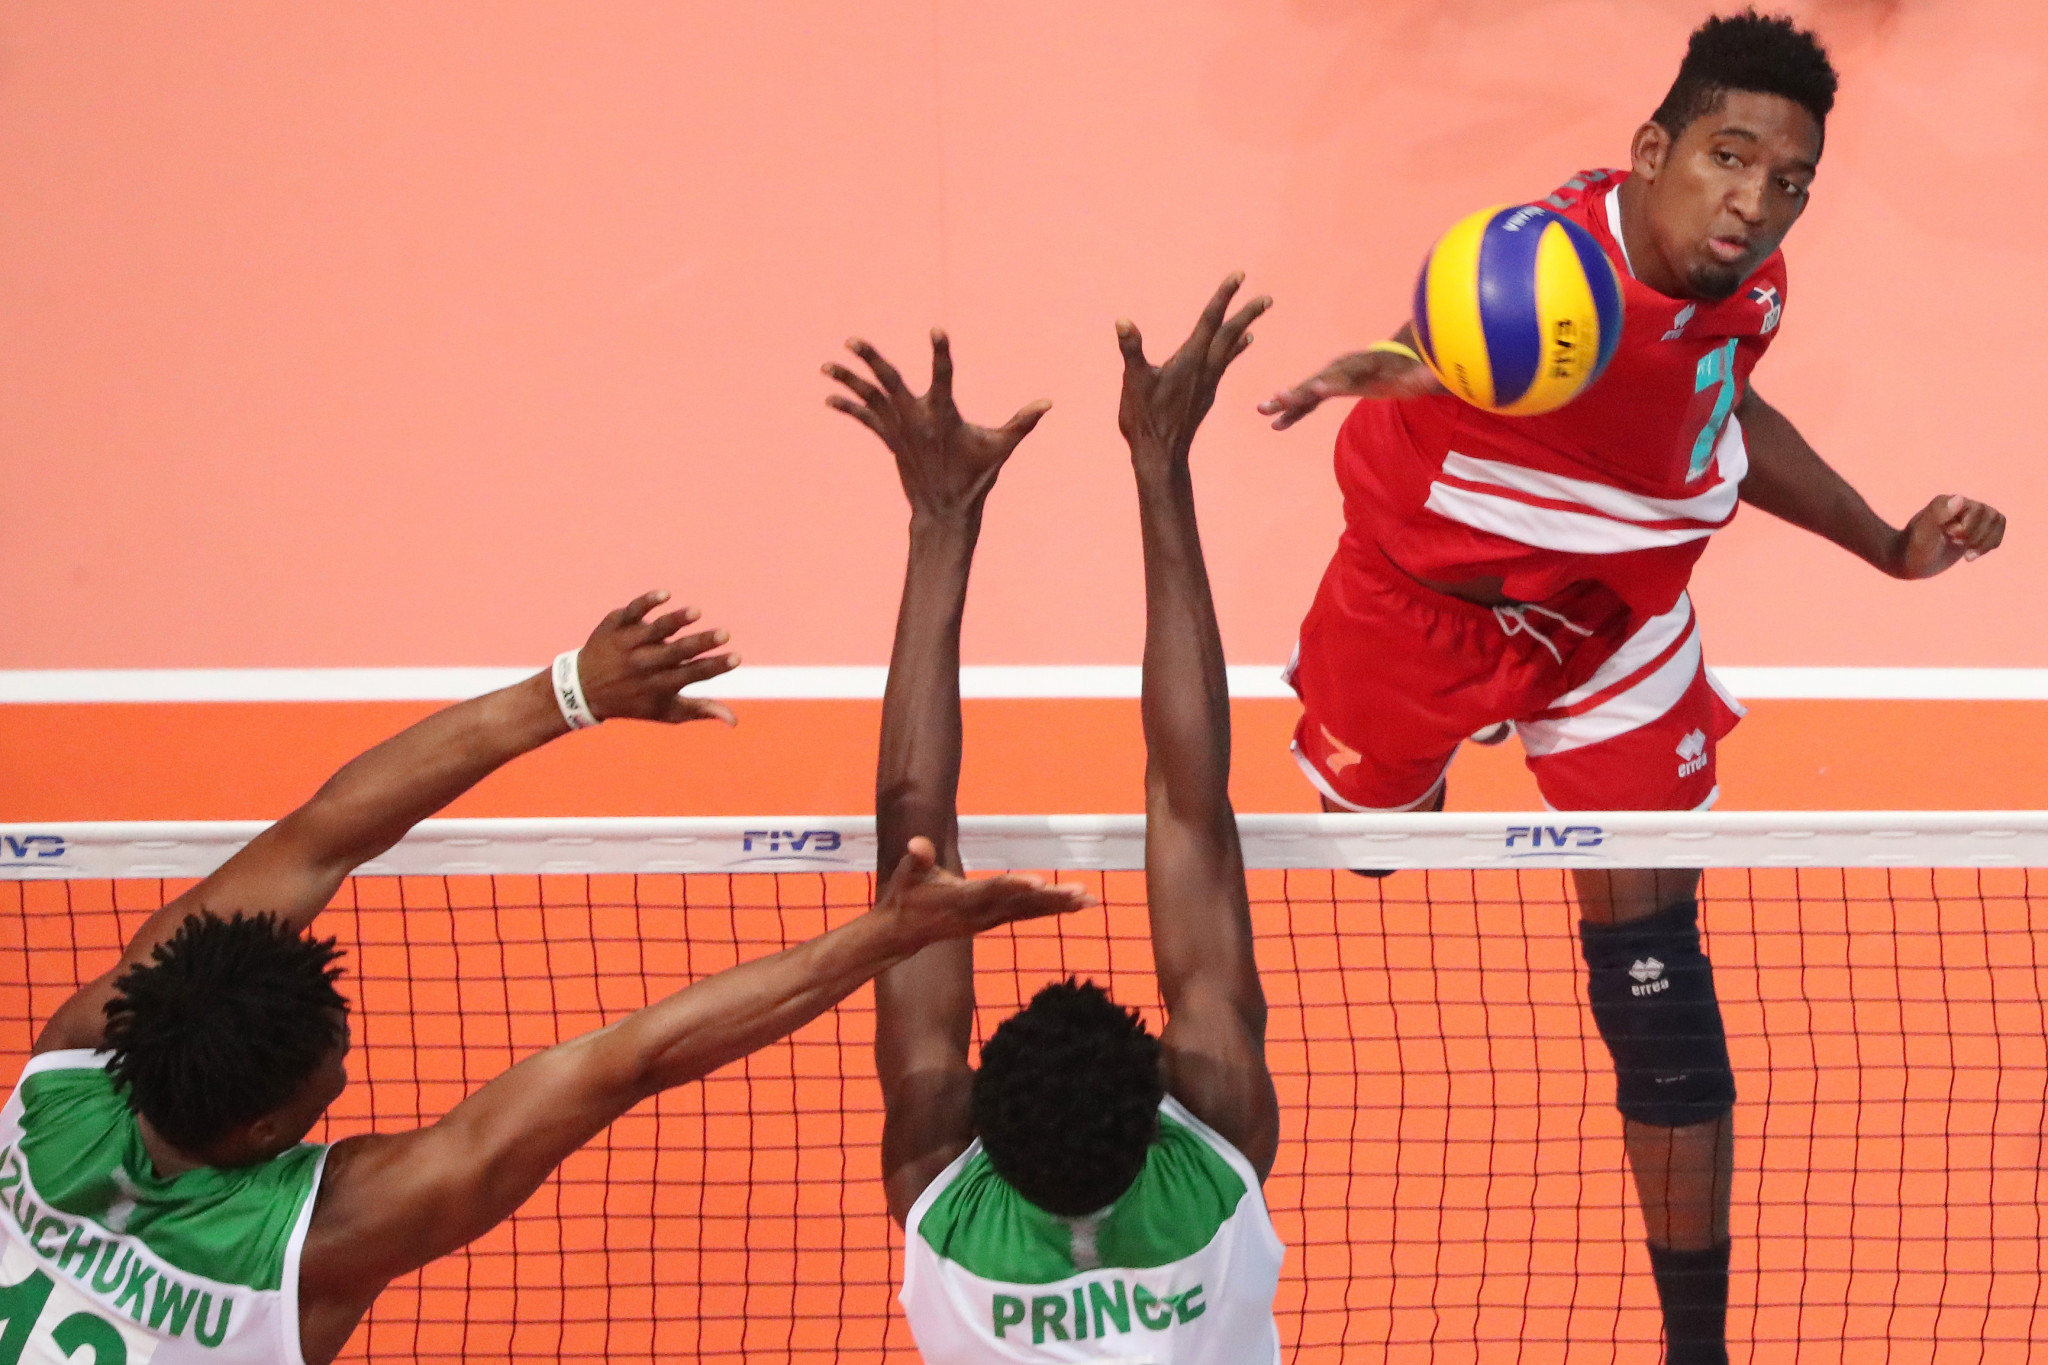 Bulgaria and Nigeria book last-16 berths at FIVB Boys' Under-19 World Championship